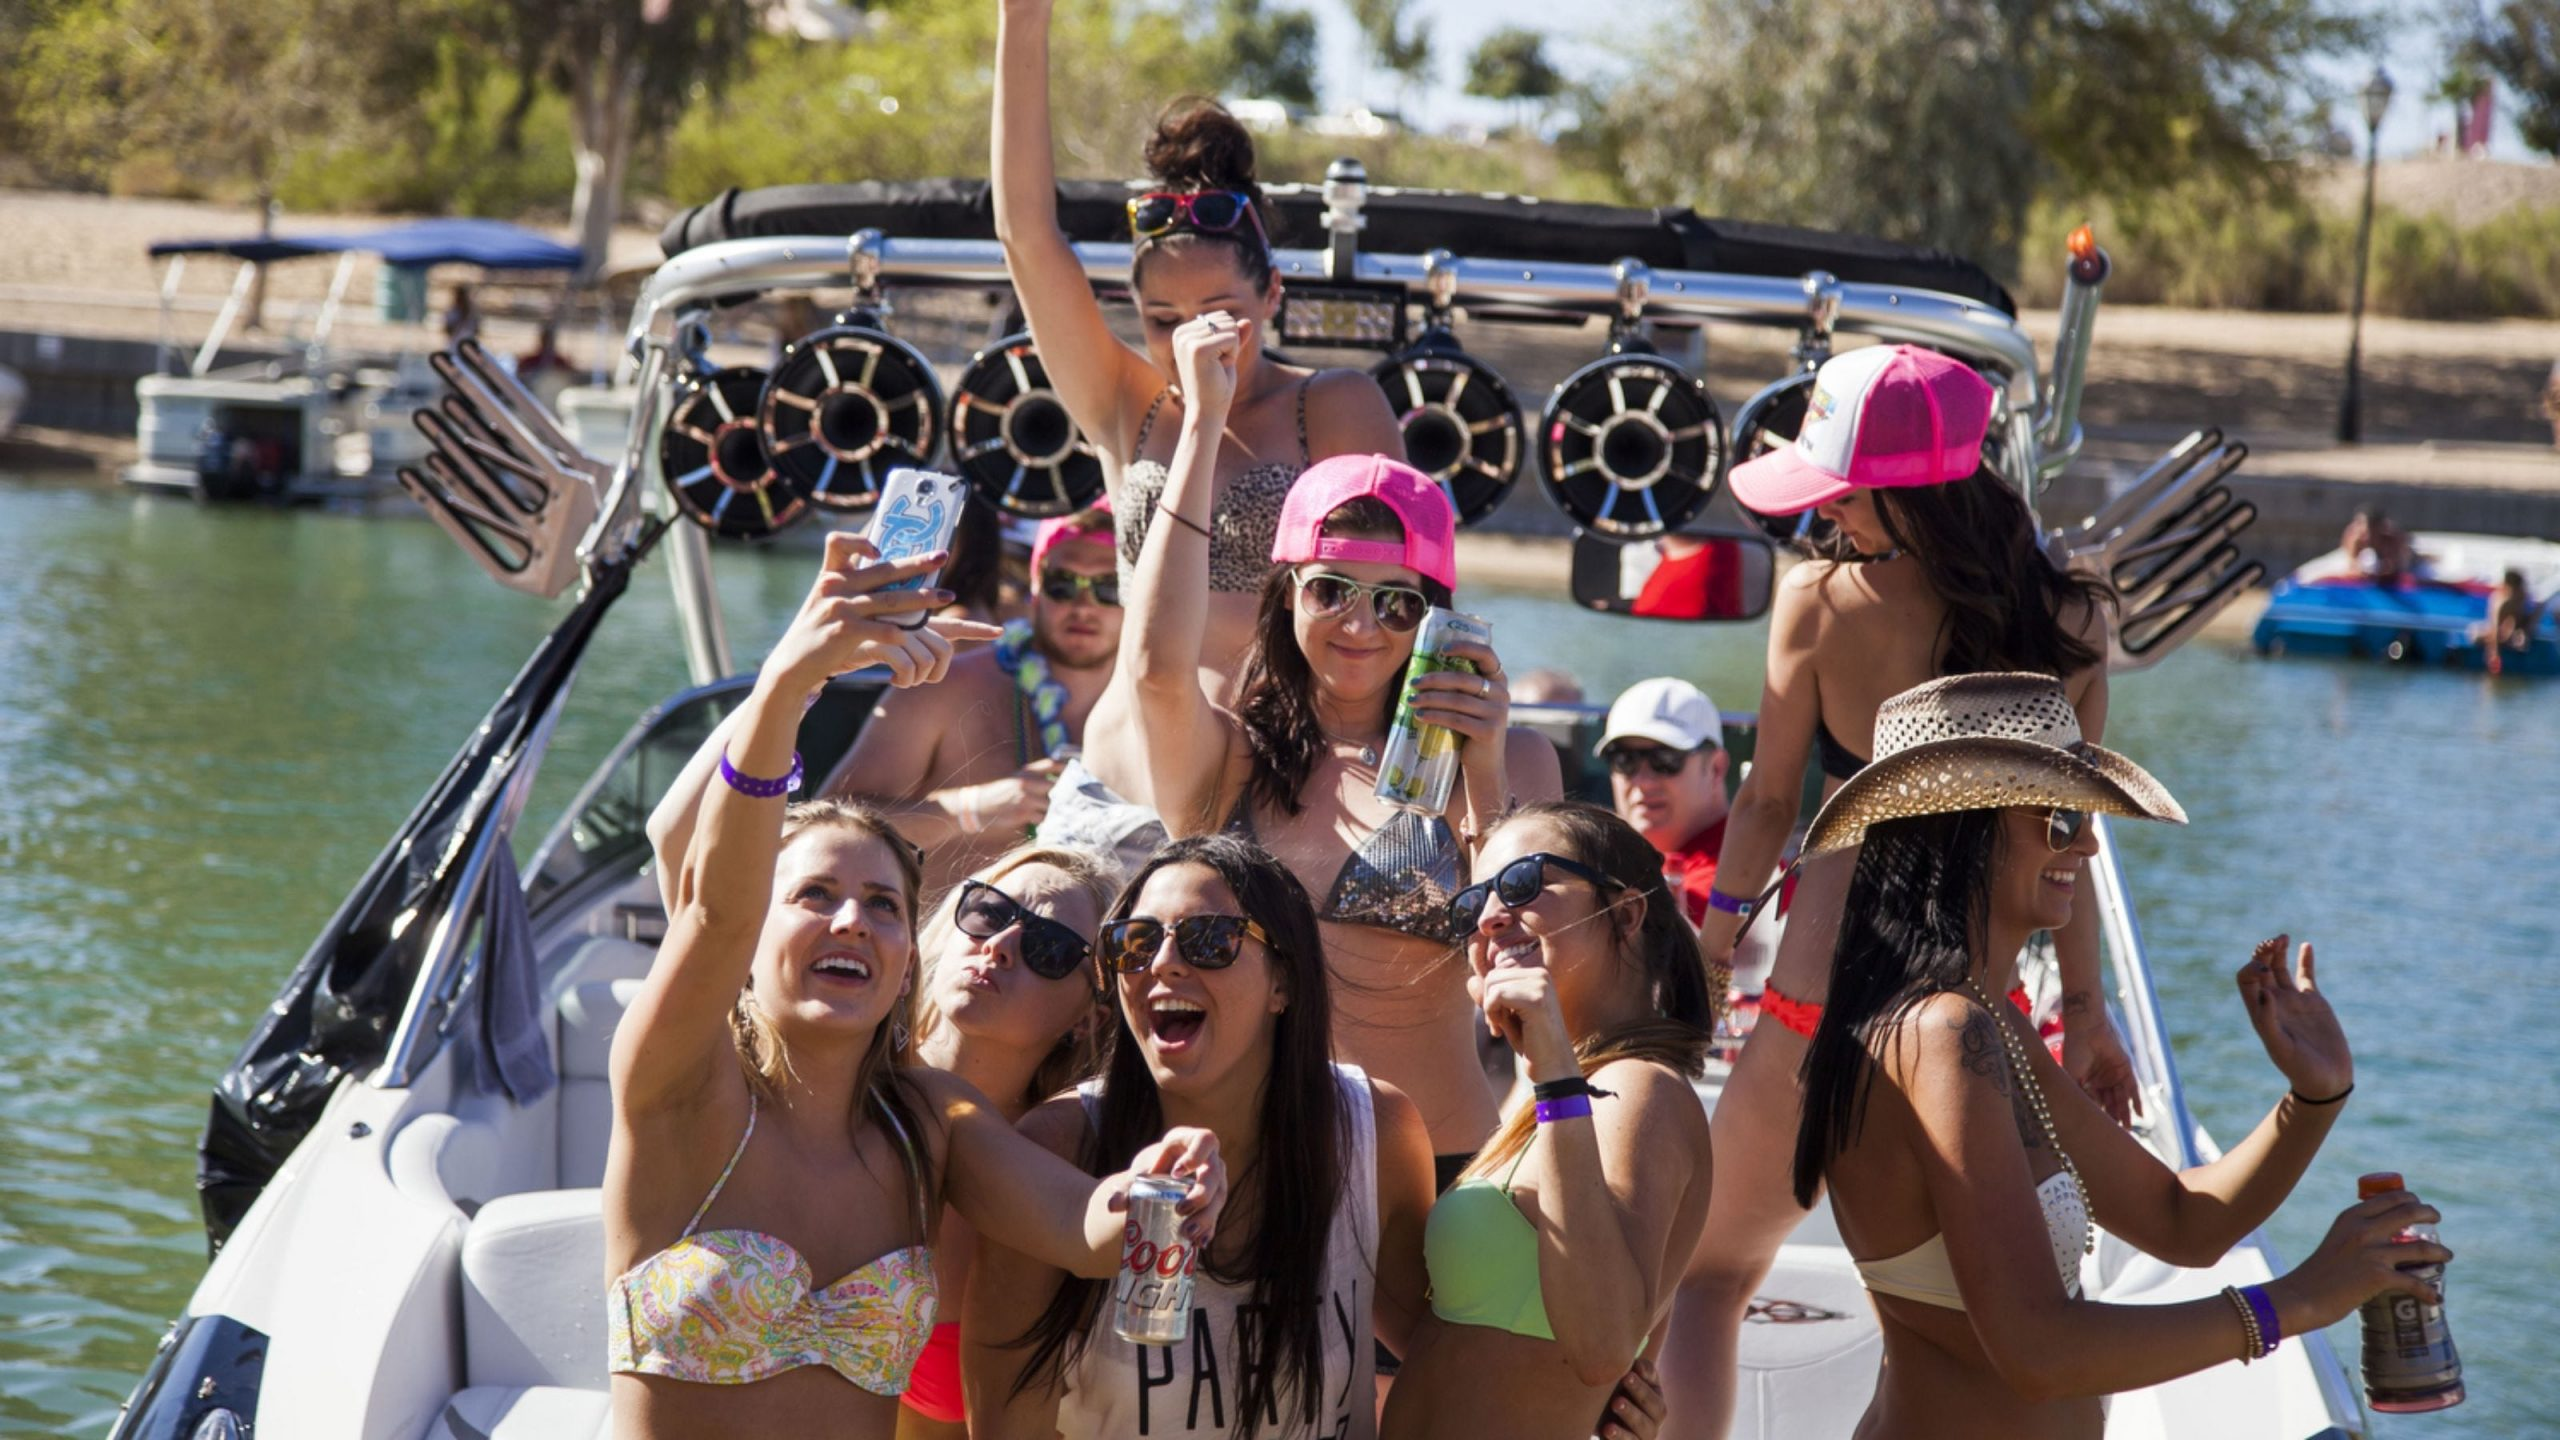 Spring Break Guide: Lake Havasu City Pertaining To When Is Spring Break For University Of Pheinix